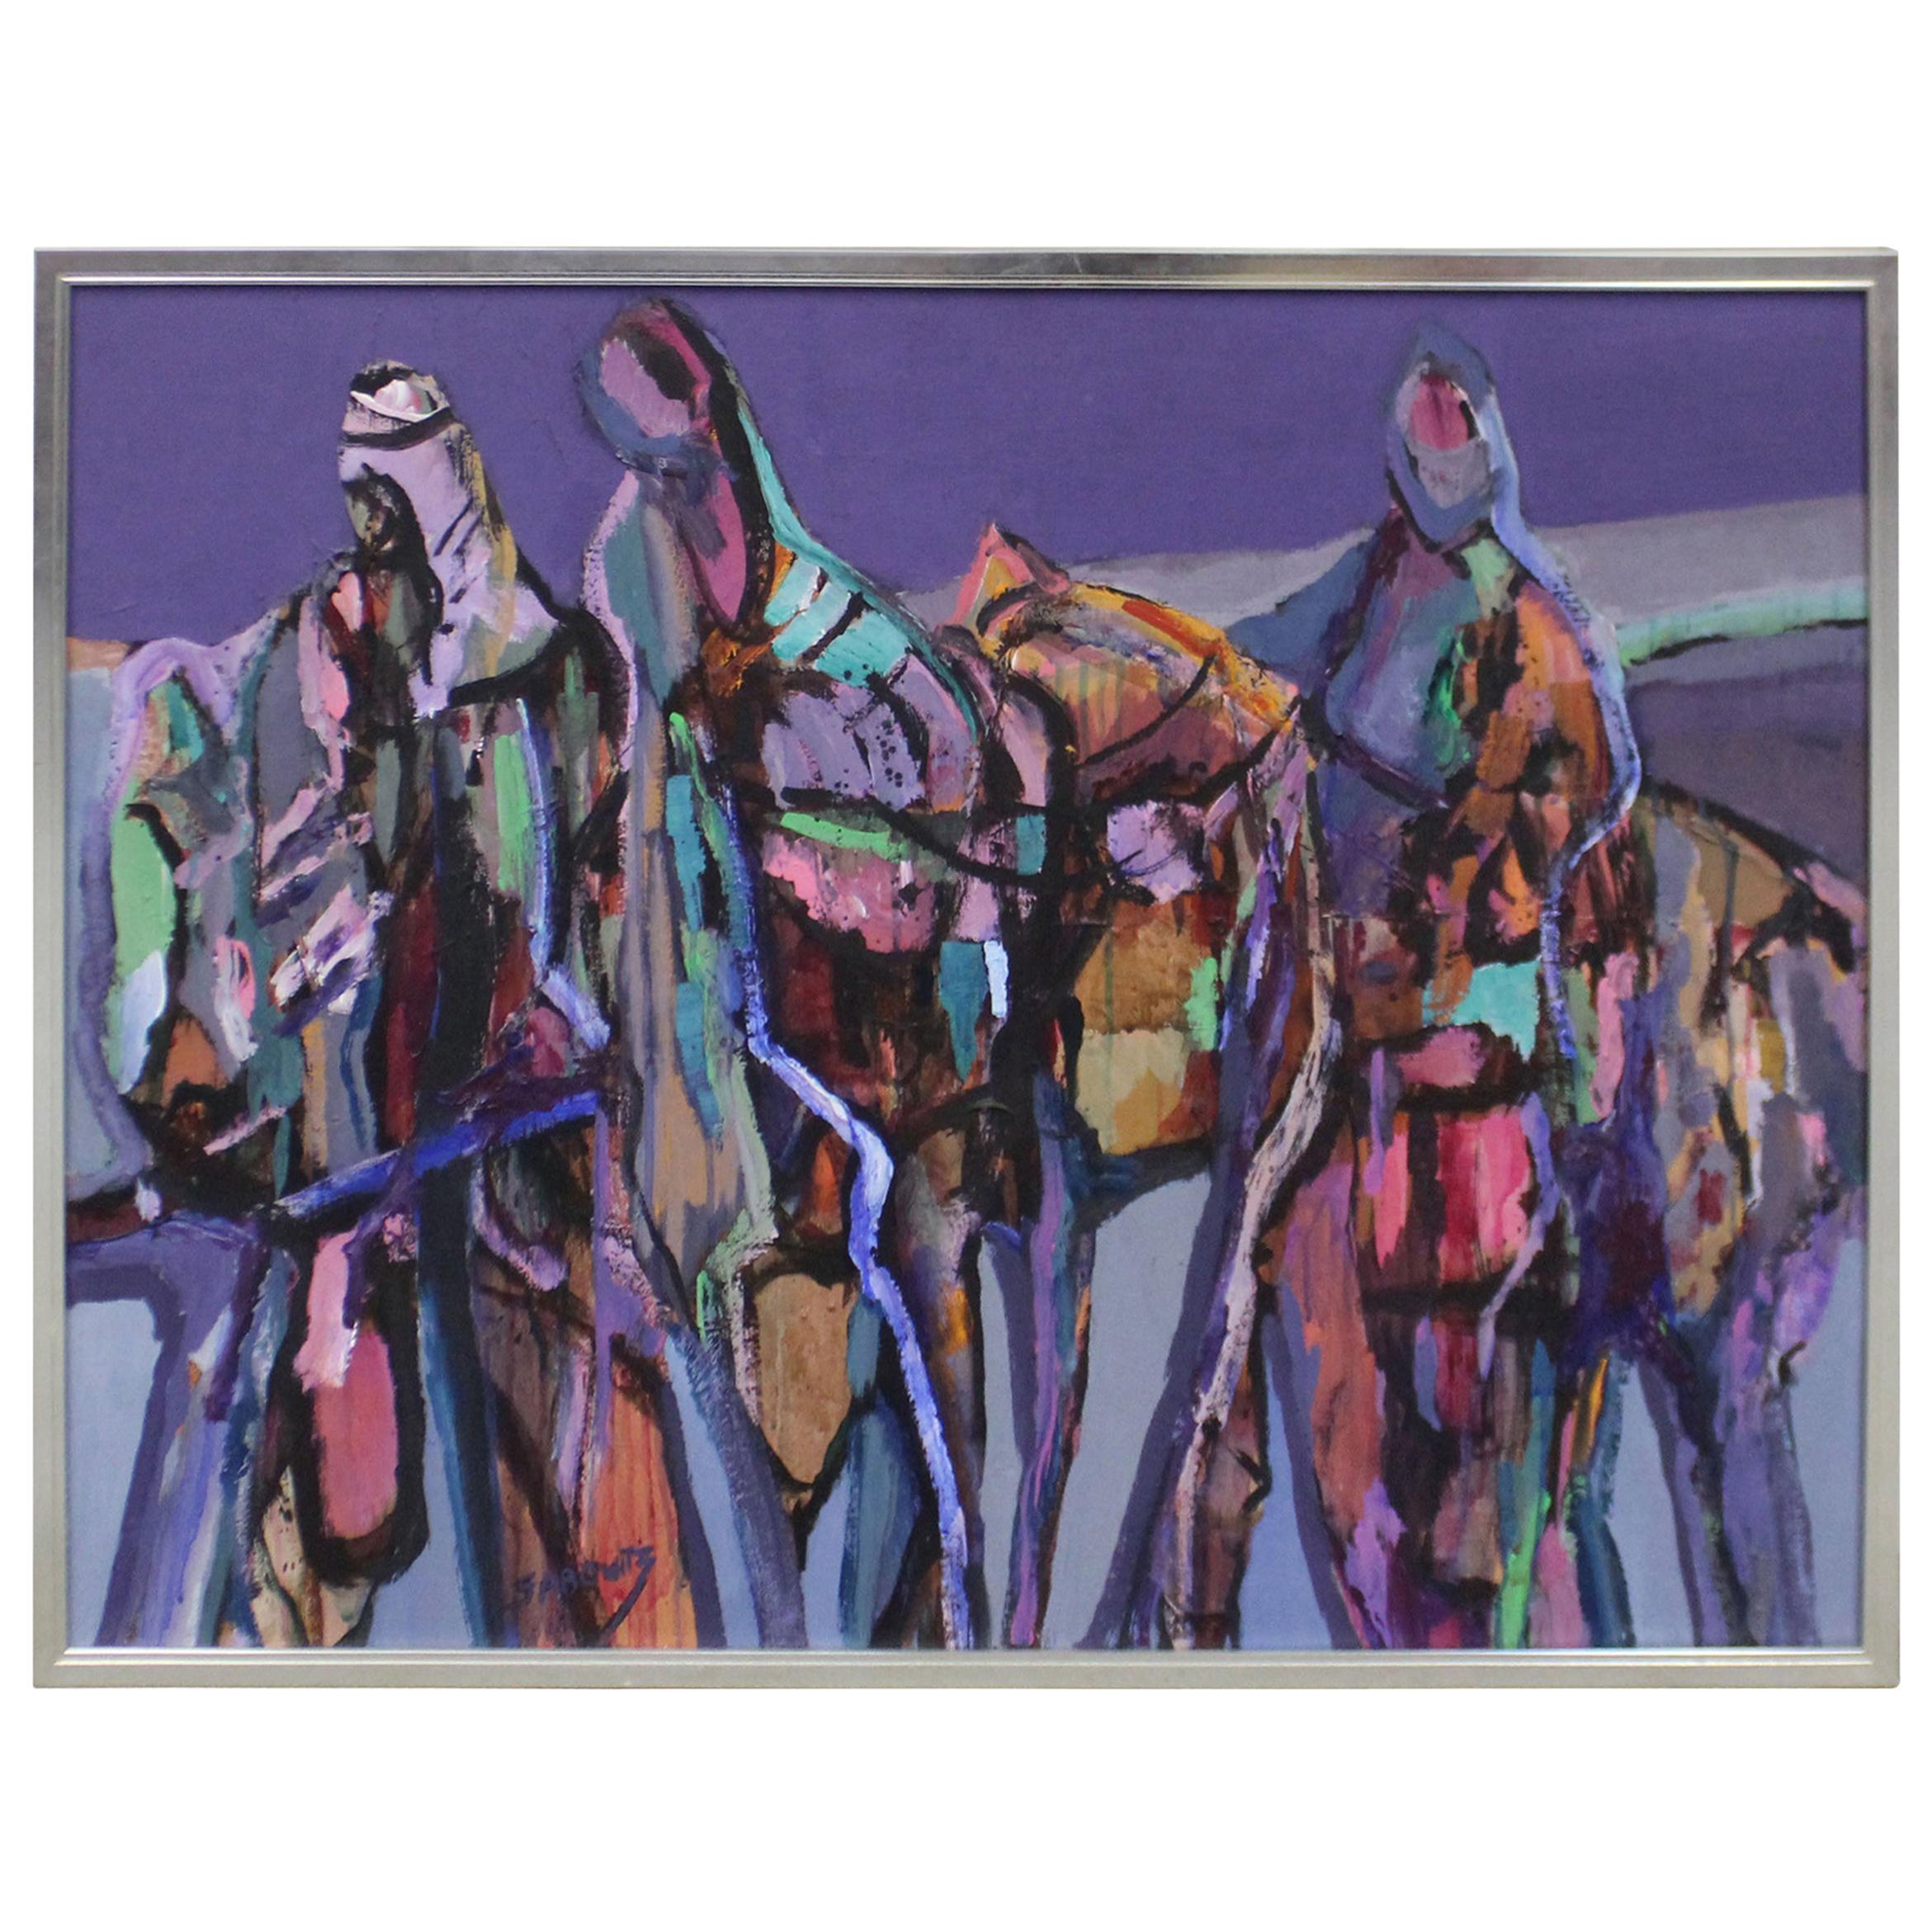 Large Vintage Modern Abstract Ruth Sabowitz 'Caravan' Canvas Painting